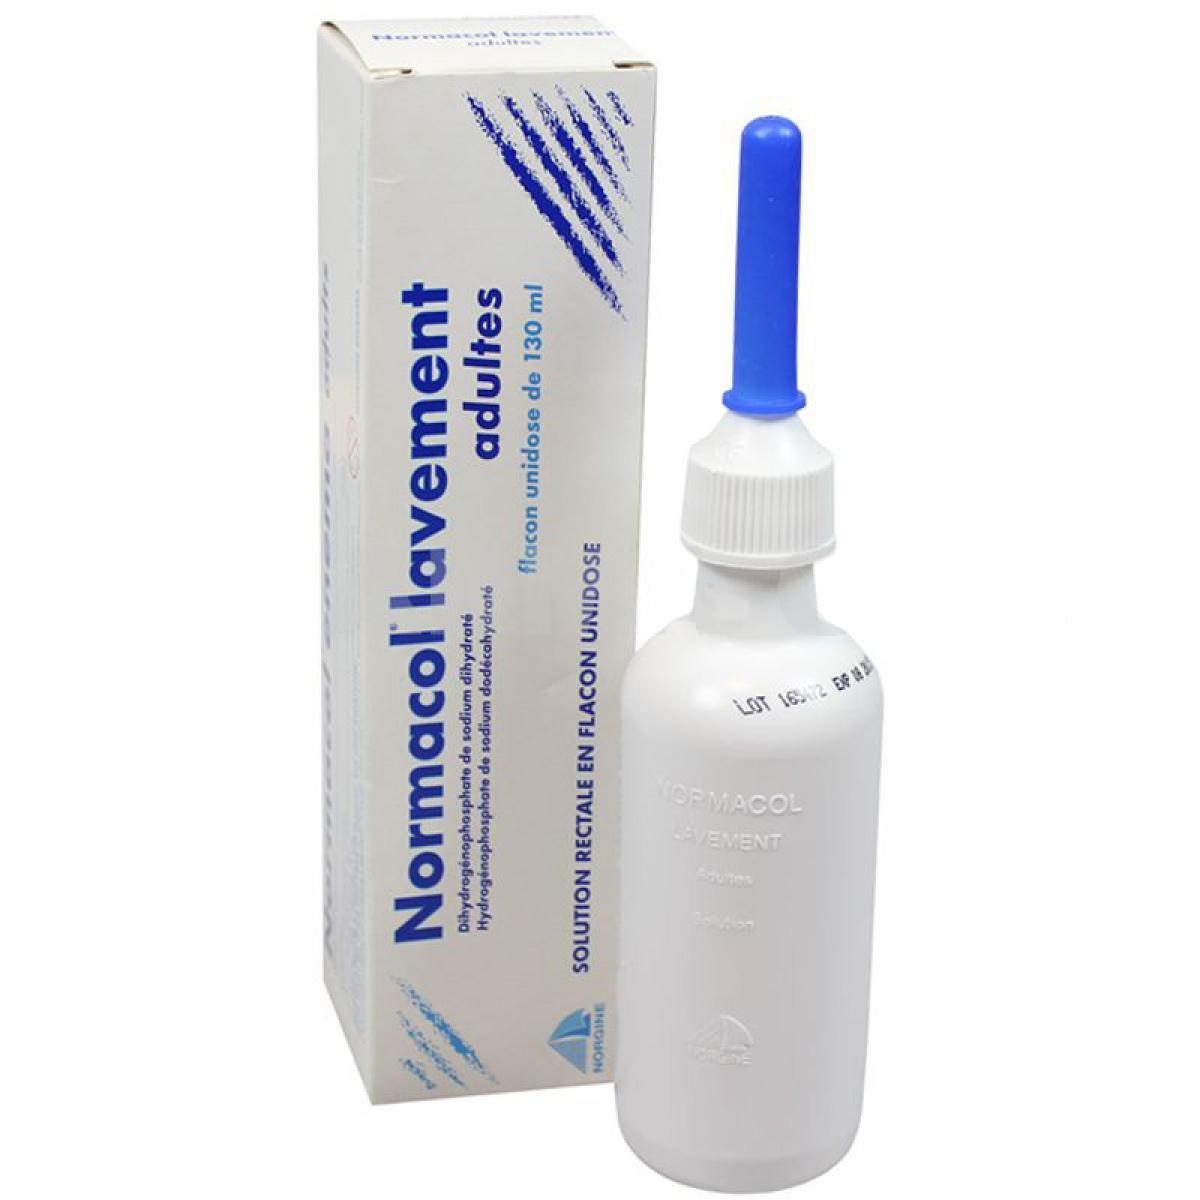 Lavement intestinal constipation - Maigrir